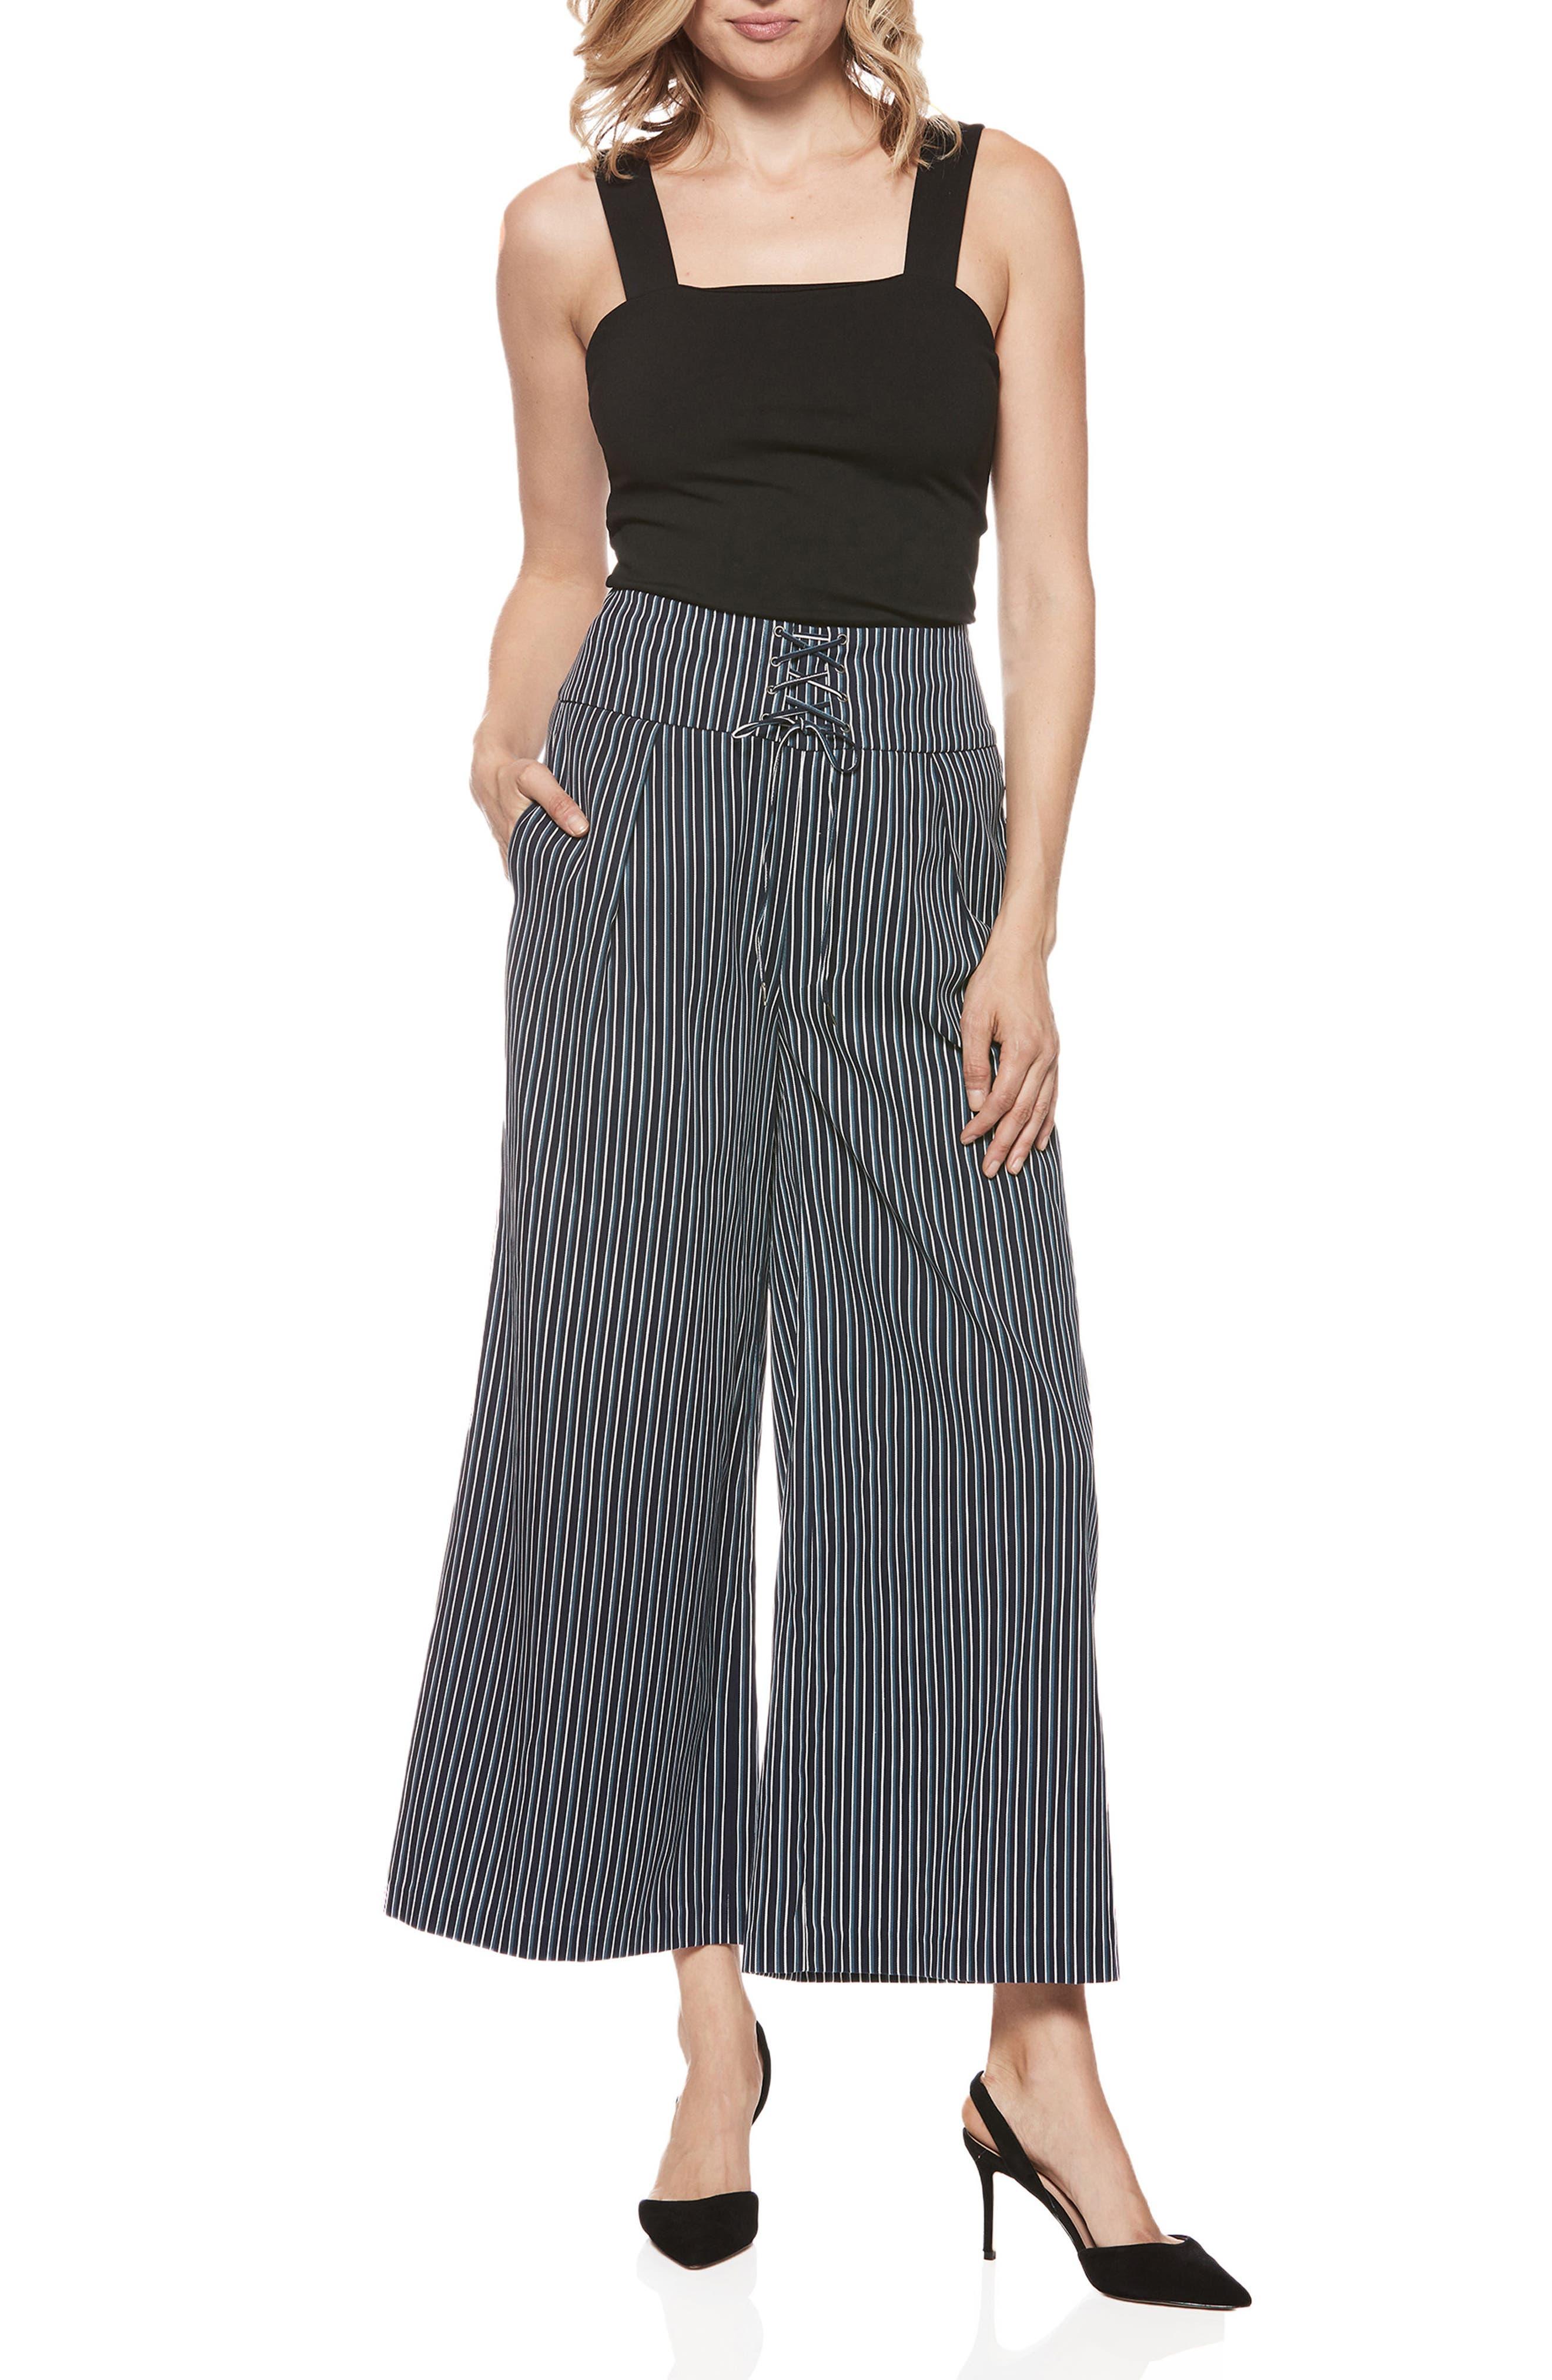 Charisma Pants,                             Alternate thumbnail 4, color,